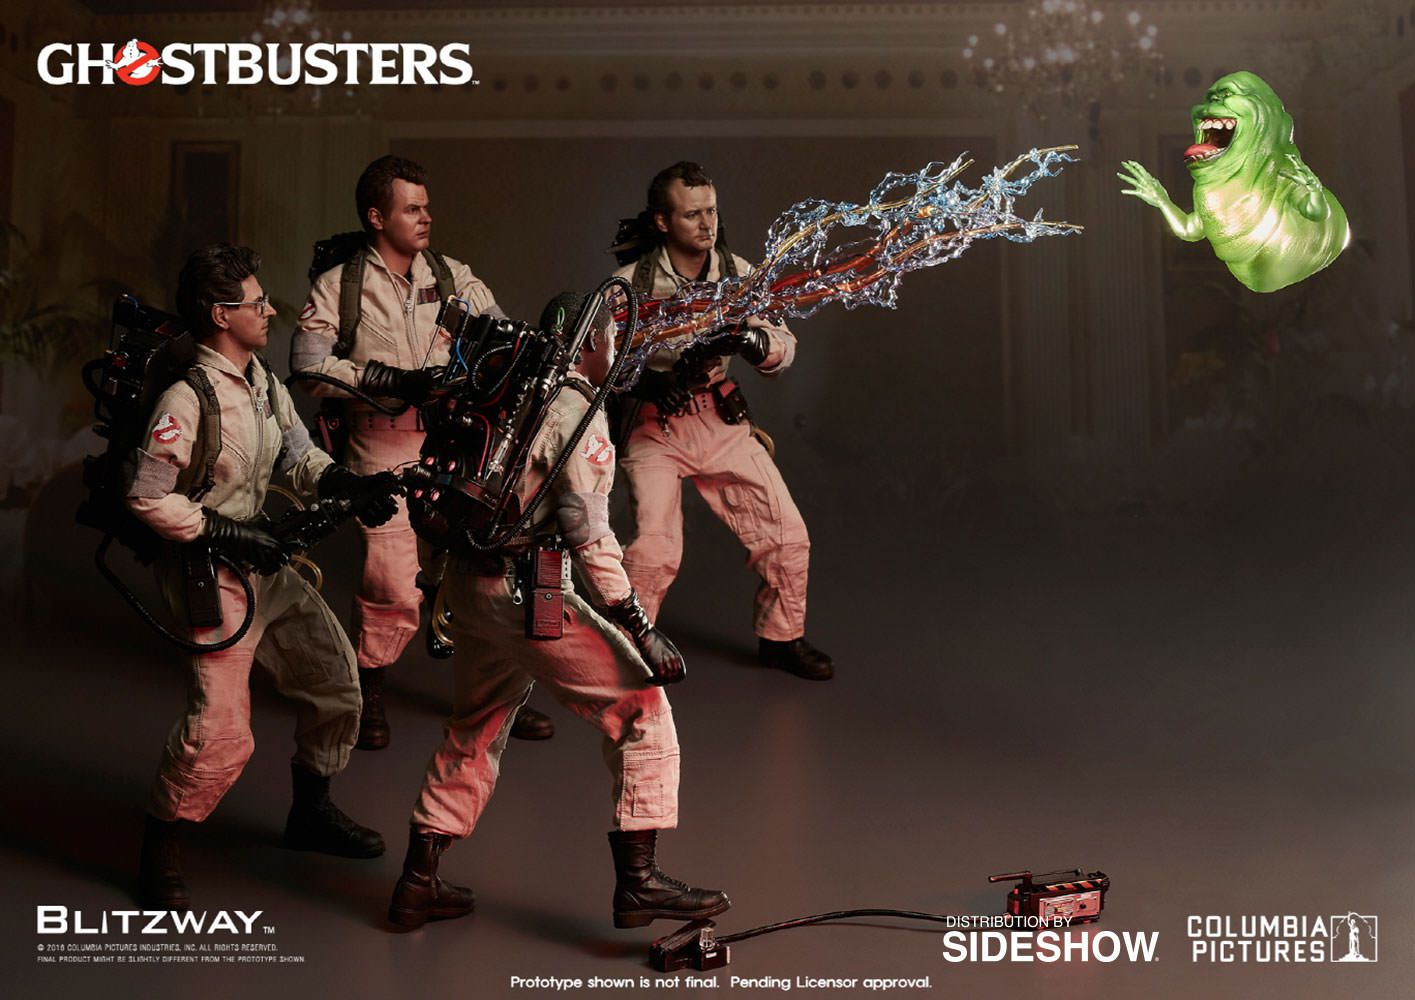 Action Figures Os Caças Fantasmas (Special Pack): Ghostbusters (1984) (BW-UMS10106) - Blitzway